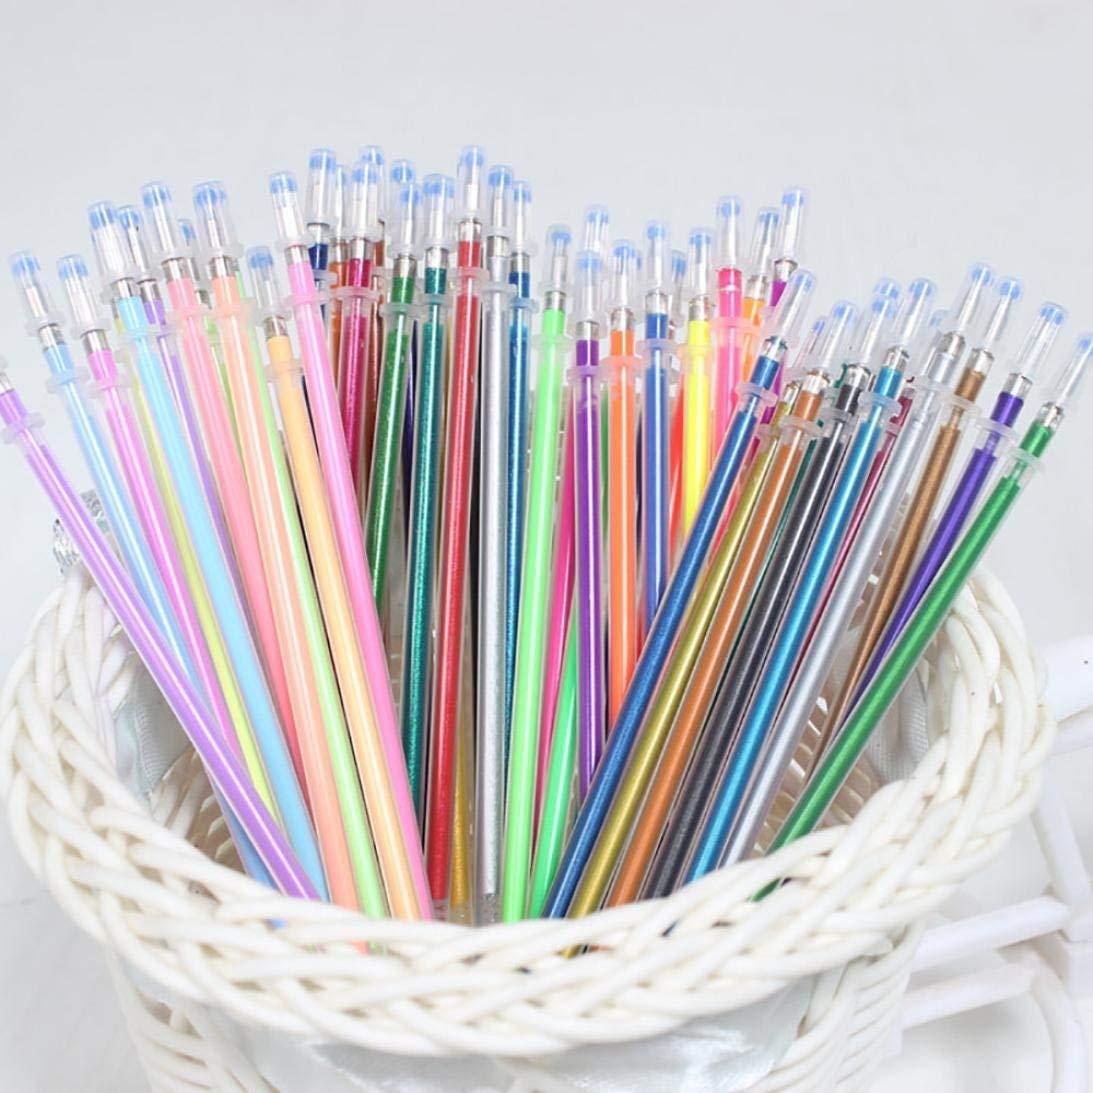 Sacow Glitter Gel Pen Refills, 48pcs Gel Pens Gel Refills Rollerball Pastel Neon Glitter Pen Drawing Colors